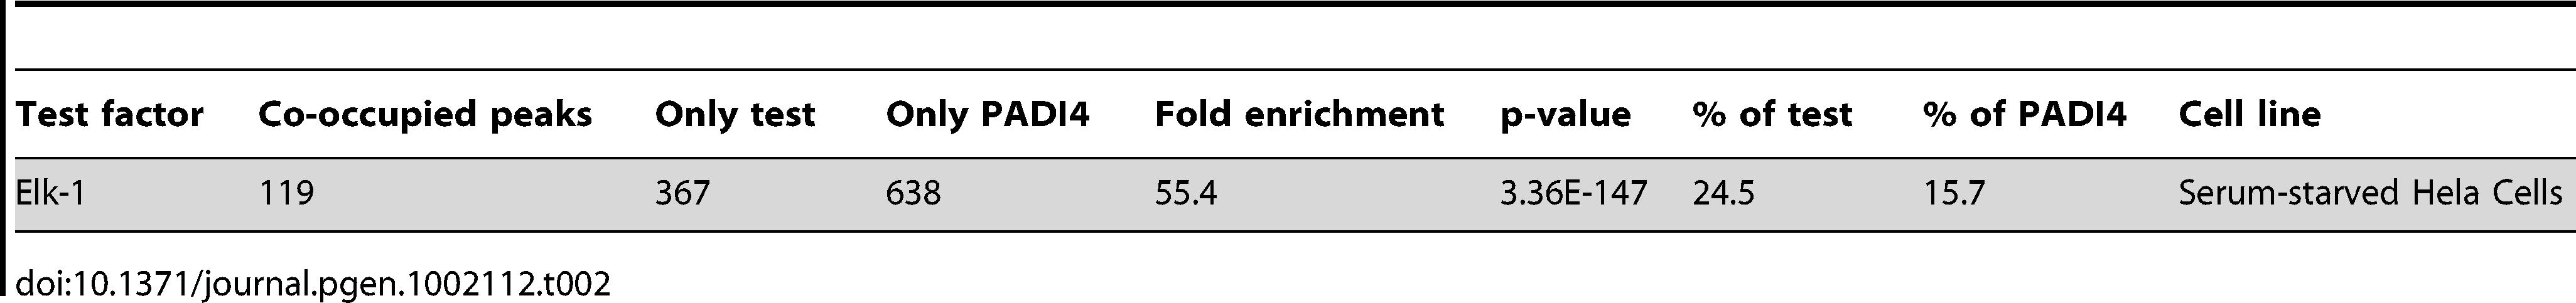 "Comparison of PADI4 ChIP-chip with Elk-1 ChIP-chip dataset <em class=""ref"">[33]</em>."